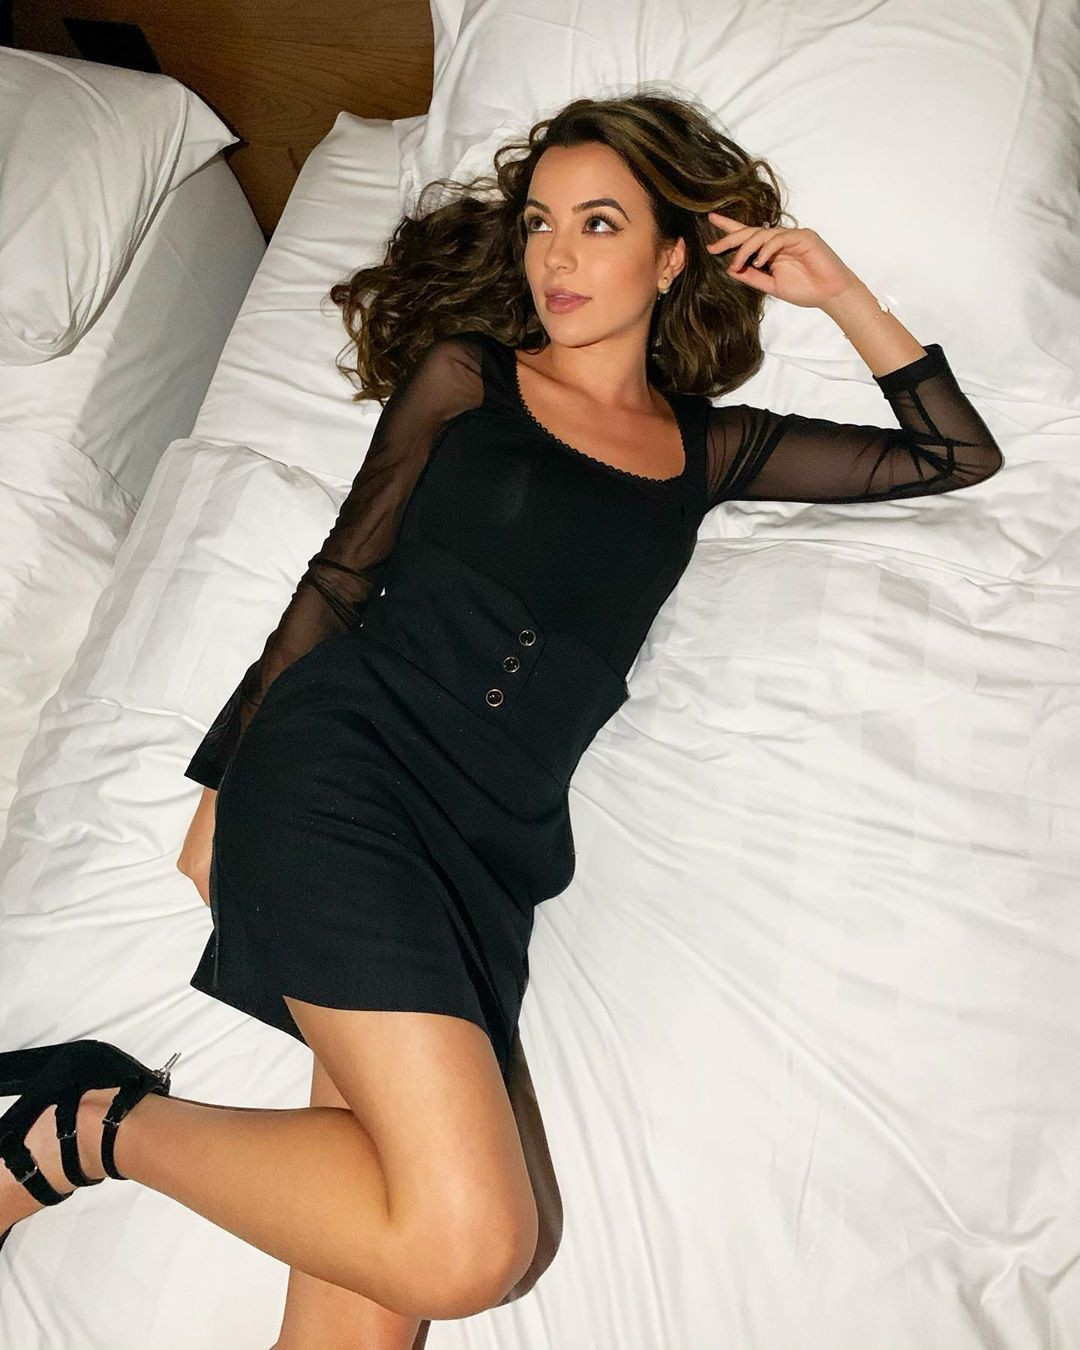 Vanessa Merrell photoshoot poses, thigh pics, legs pic